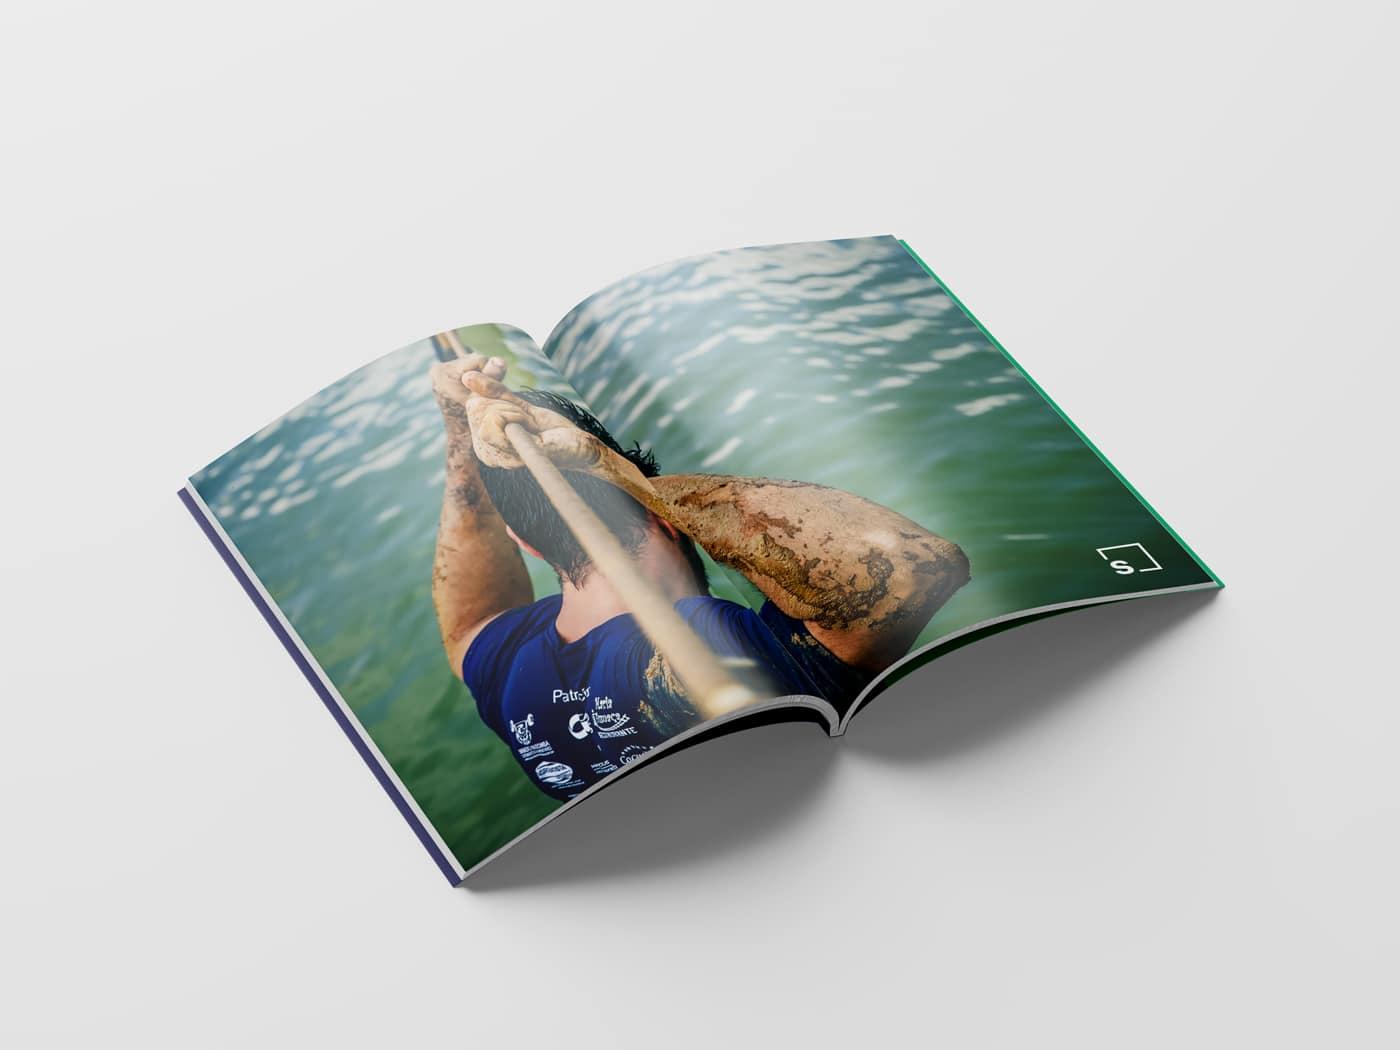 Erlebniswelt Strohofer Broschüre Doppelseite Design